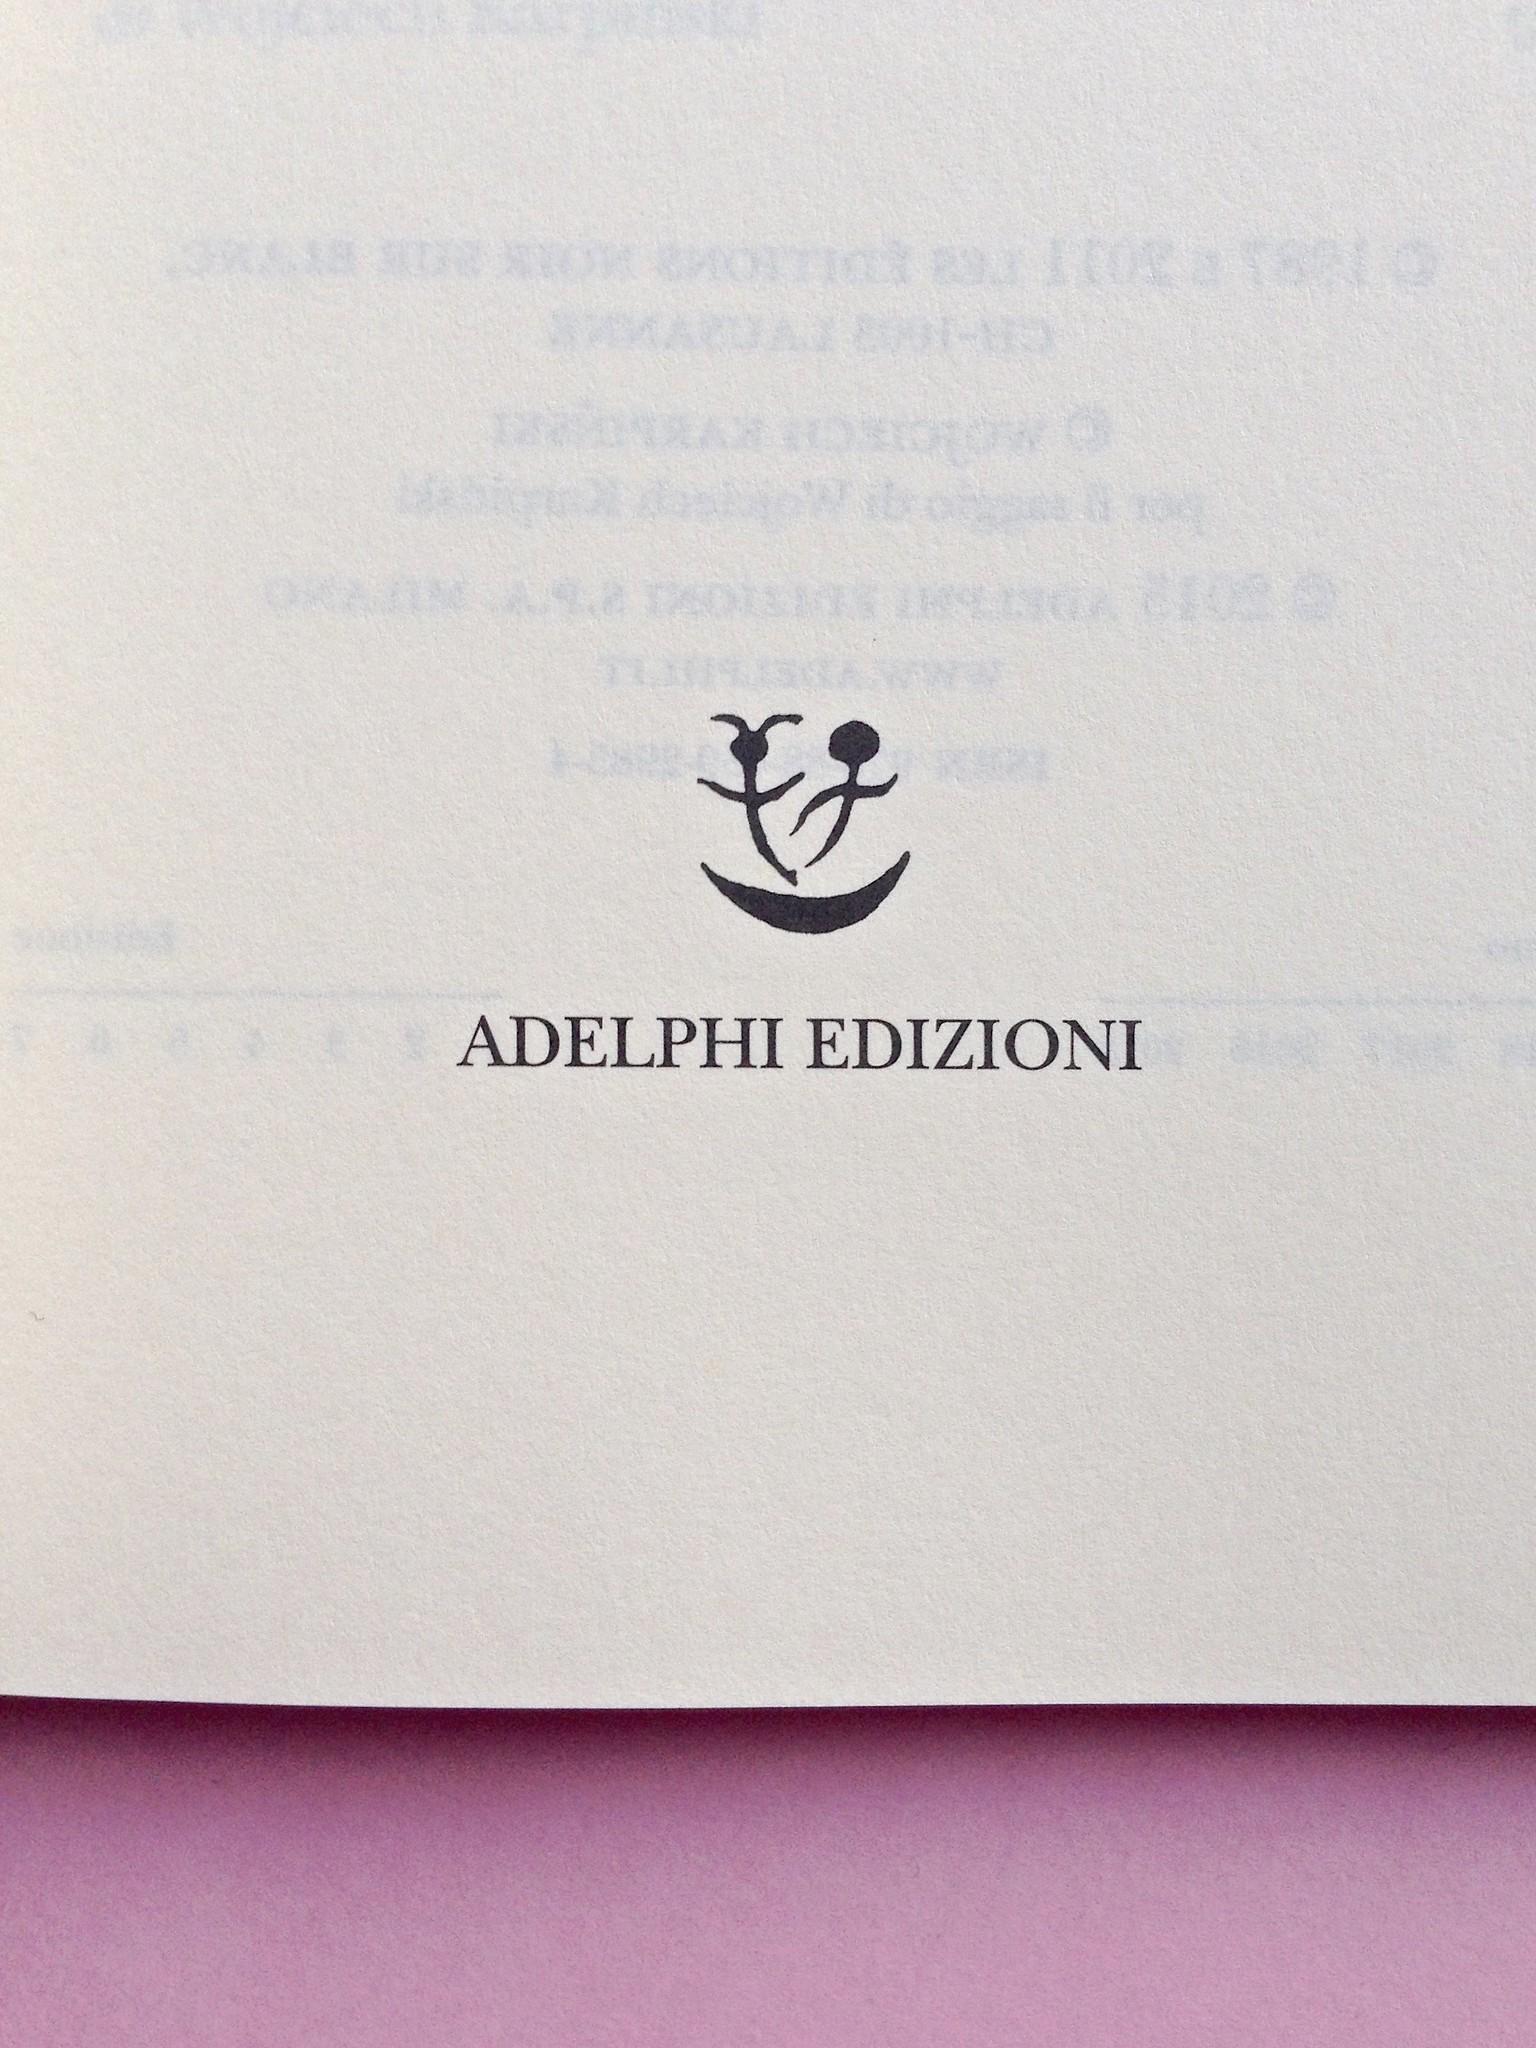 Proust a Grjazovec, di Józef Czapski. Adelphi 2015. Frontespizio, a pag. 5 (part.), 1